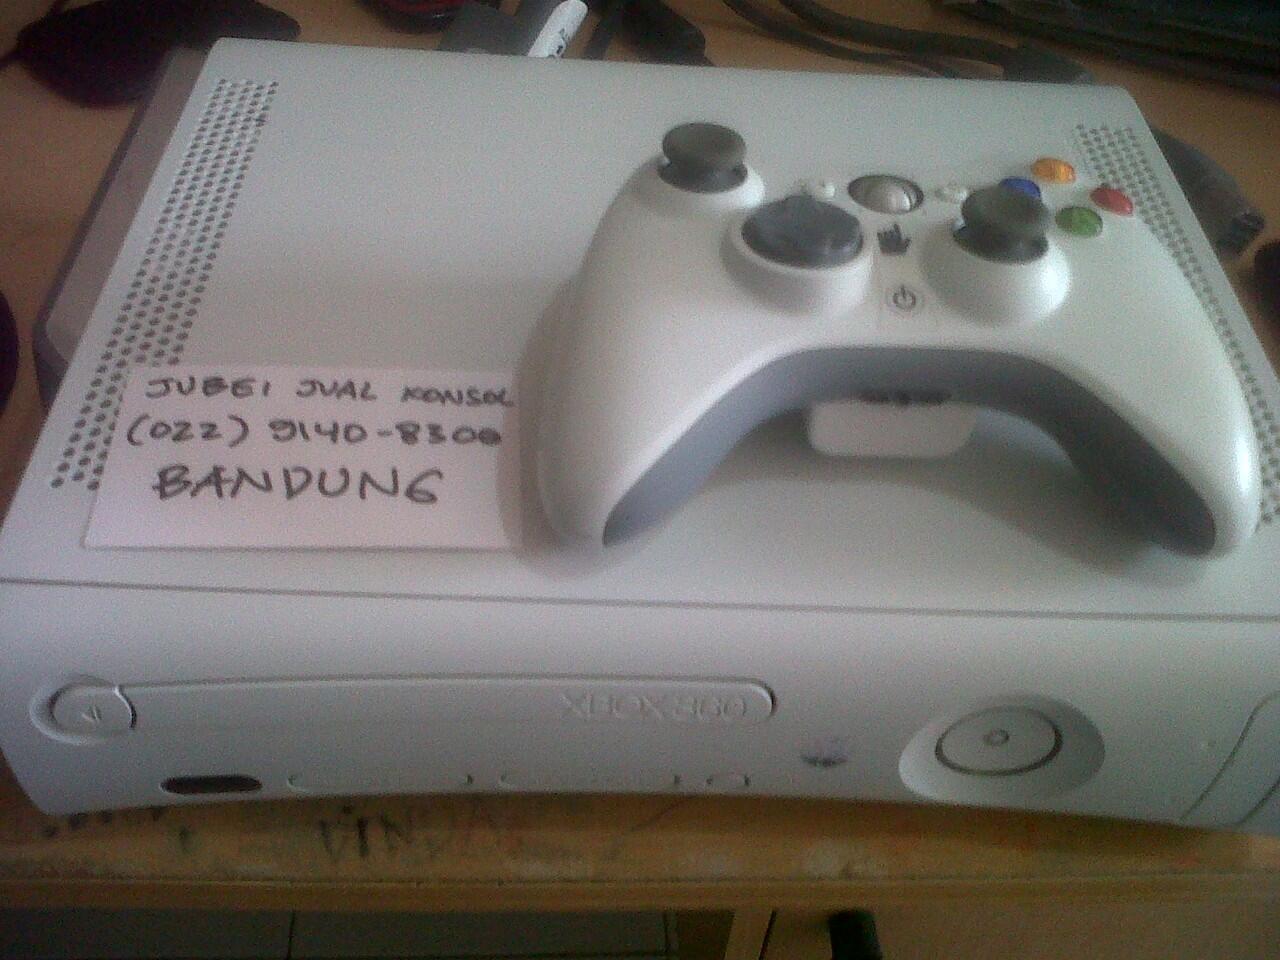 DIBELI CEPAT !!! PS3, XBOX 360, PS2, PSP, PSVita. BANDUNG.